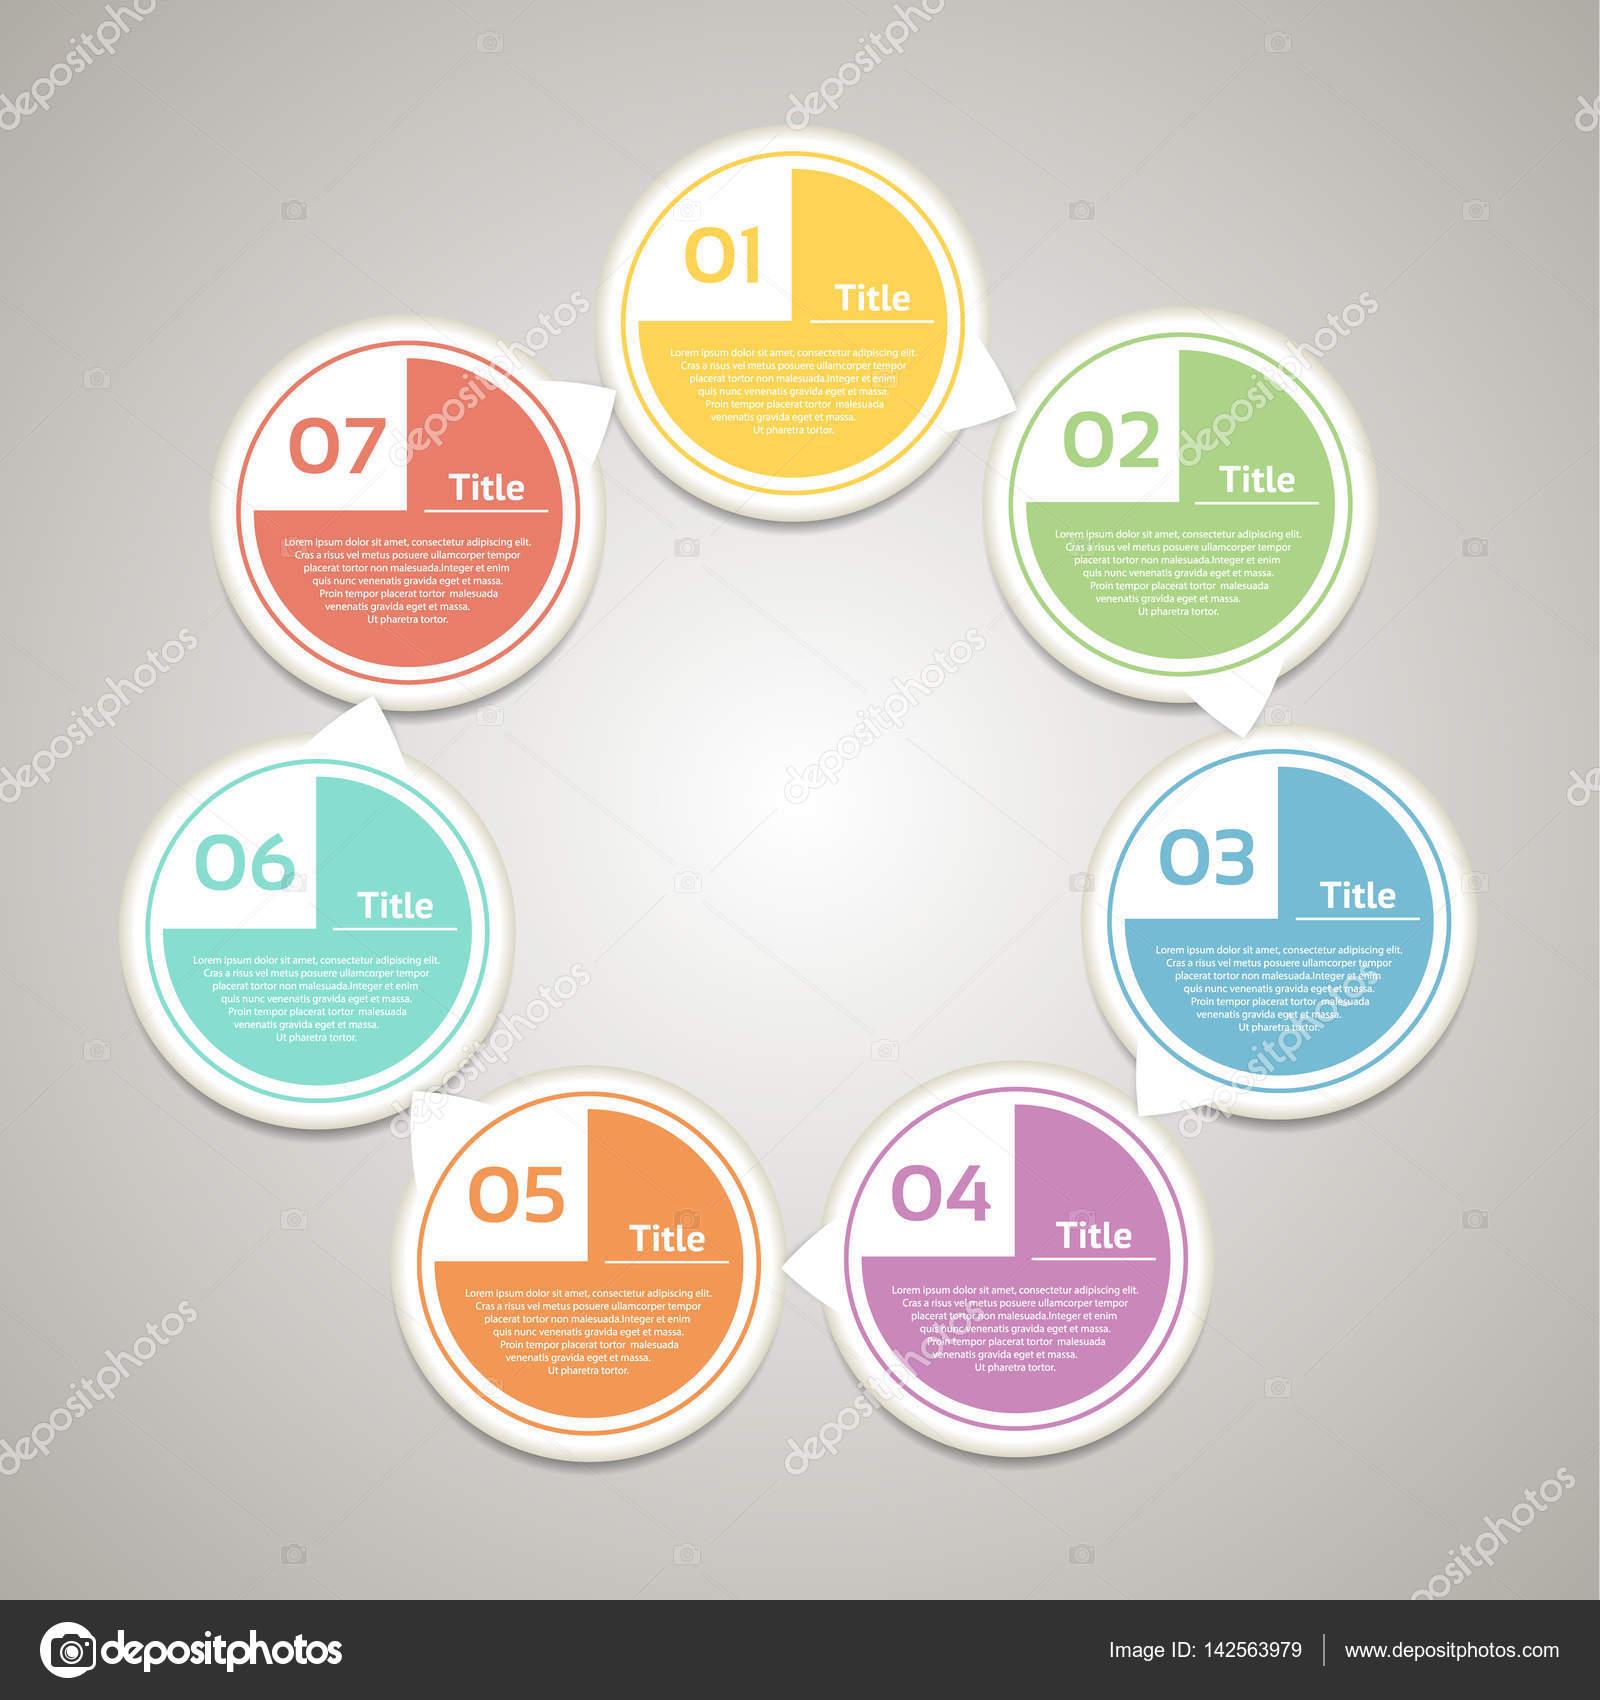 Infogrfico de crculo de vetor modelo de diagrama grfico modelo de diagrama grfico apresentao e grfico conceito de negcio com 7 opes cclicas partes etapas ou processos fundo abstrato vetor de ccuart Image collections